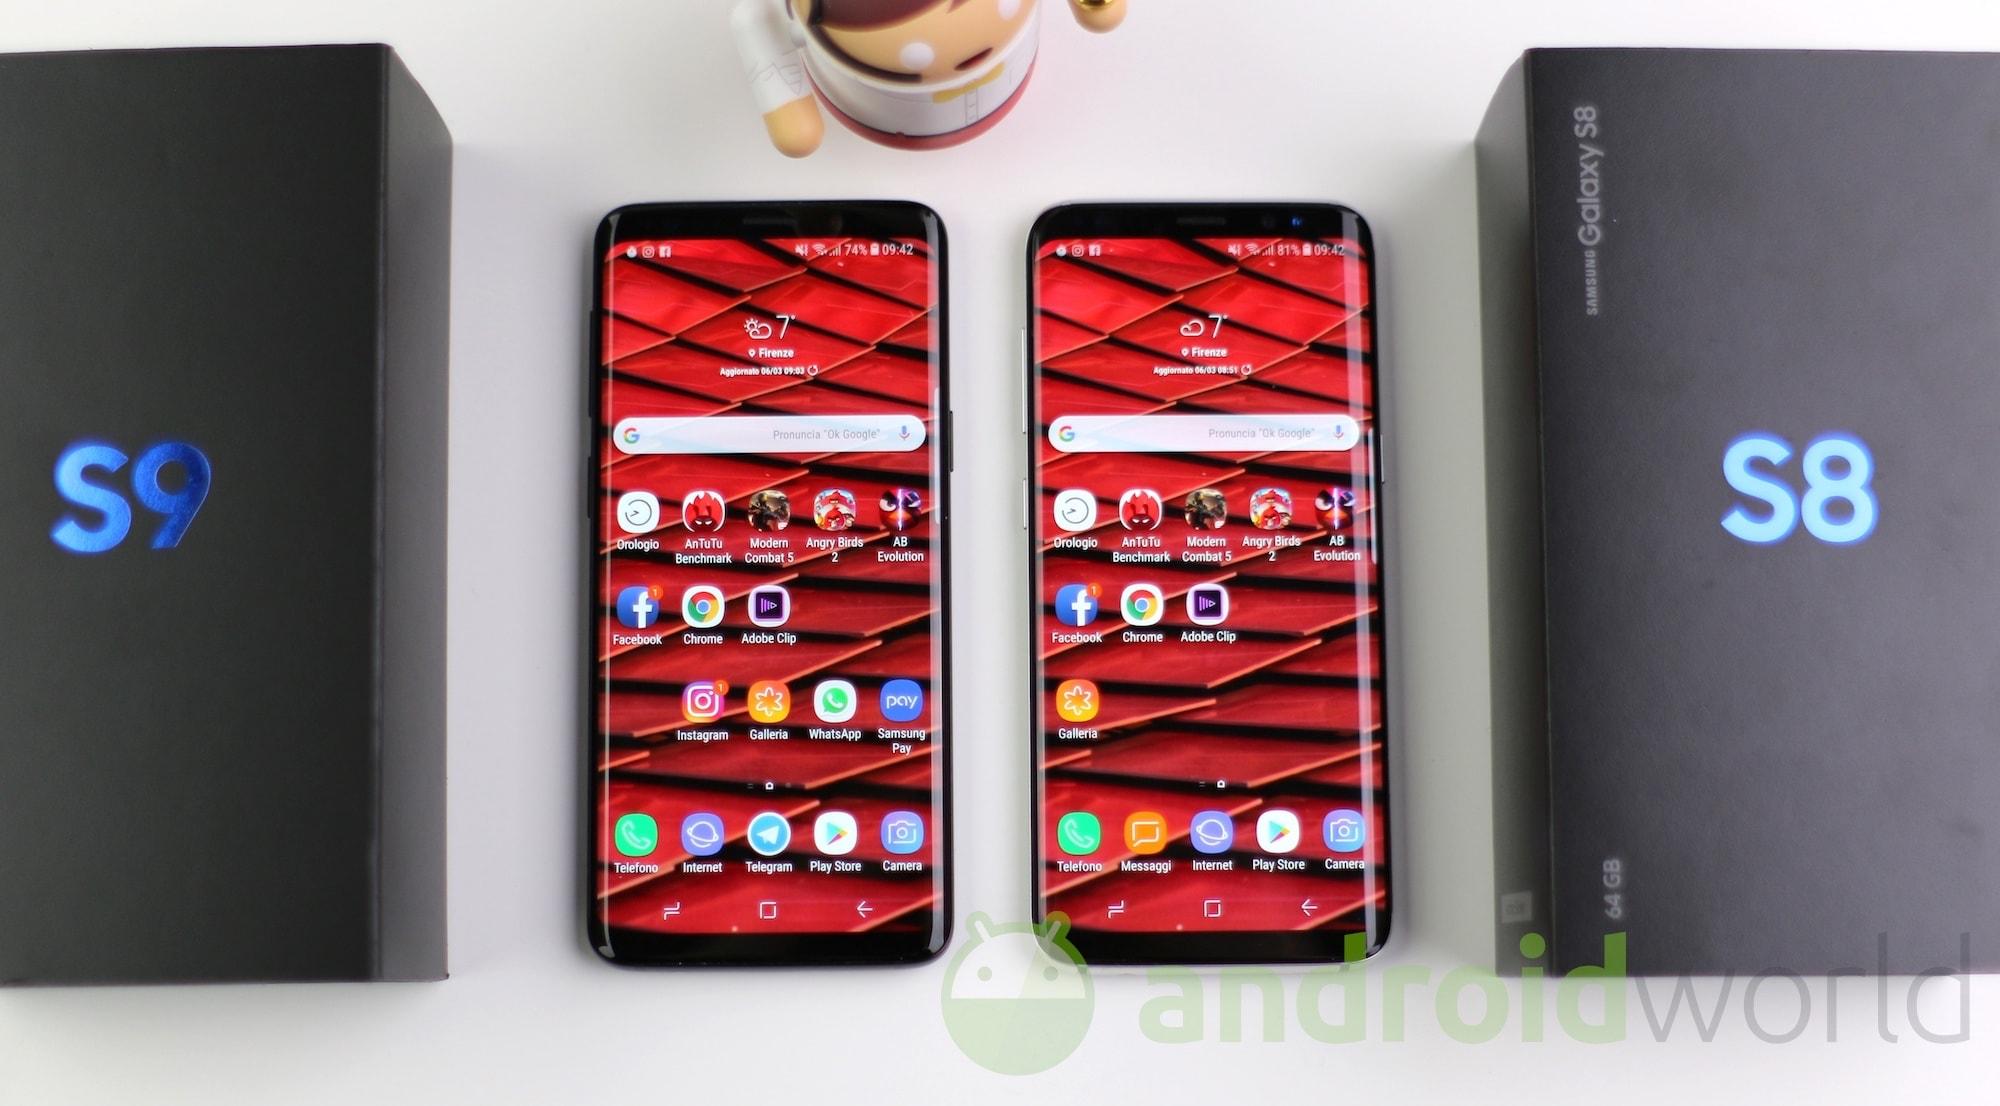 Samsung Galaxy S8 – S9 def – 2